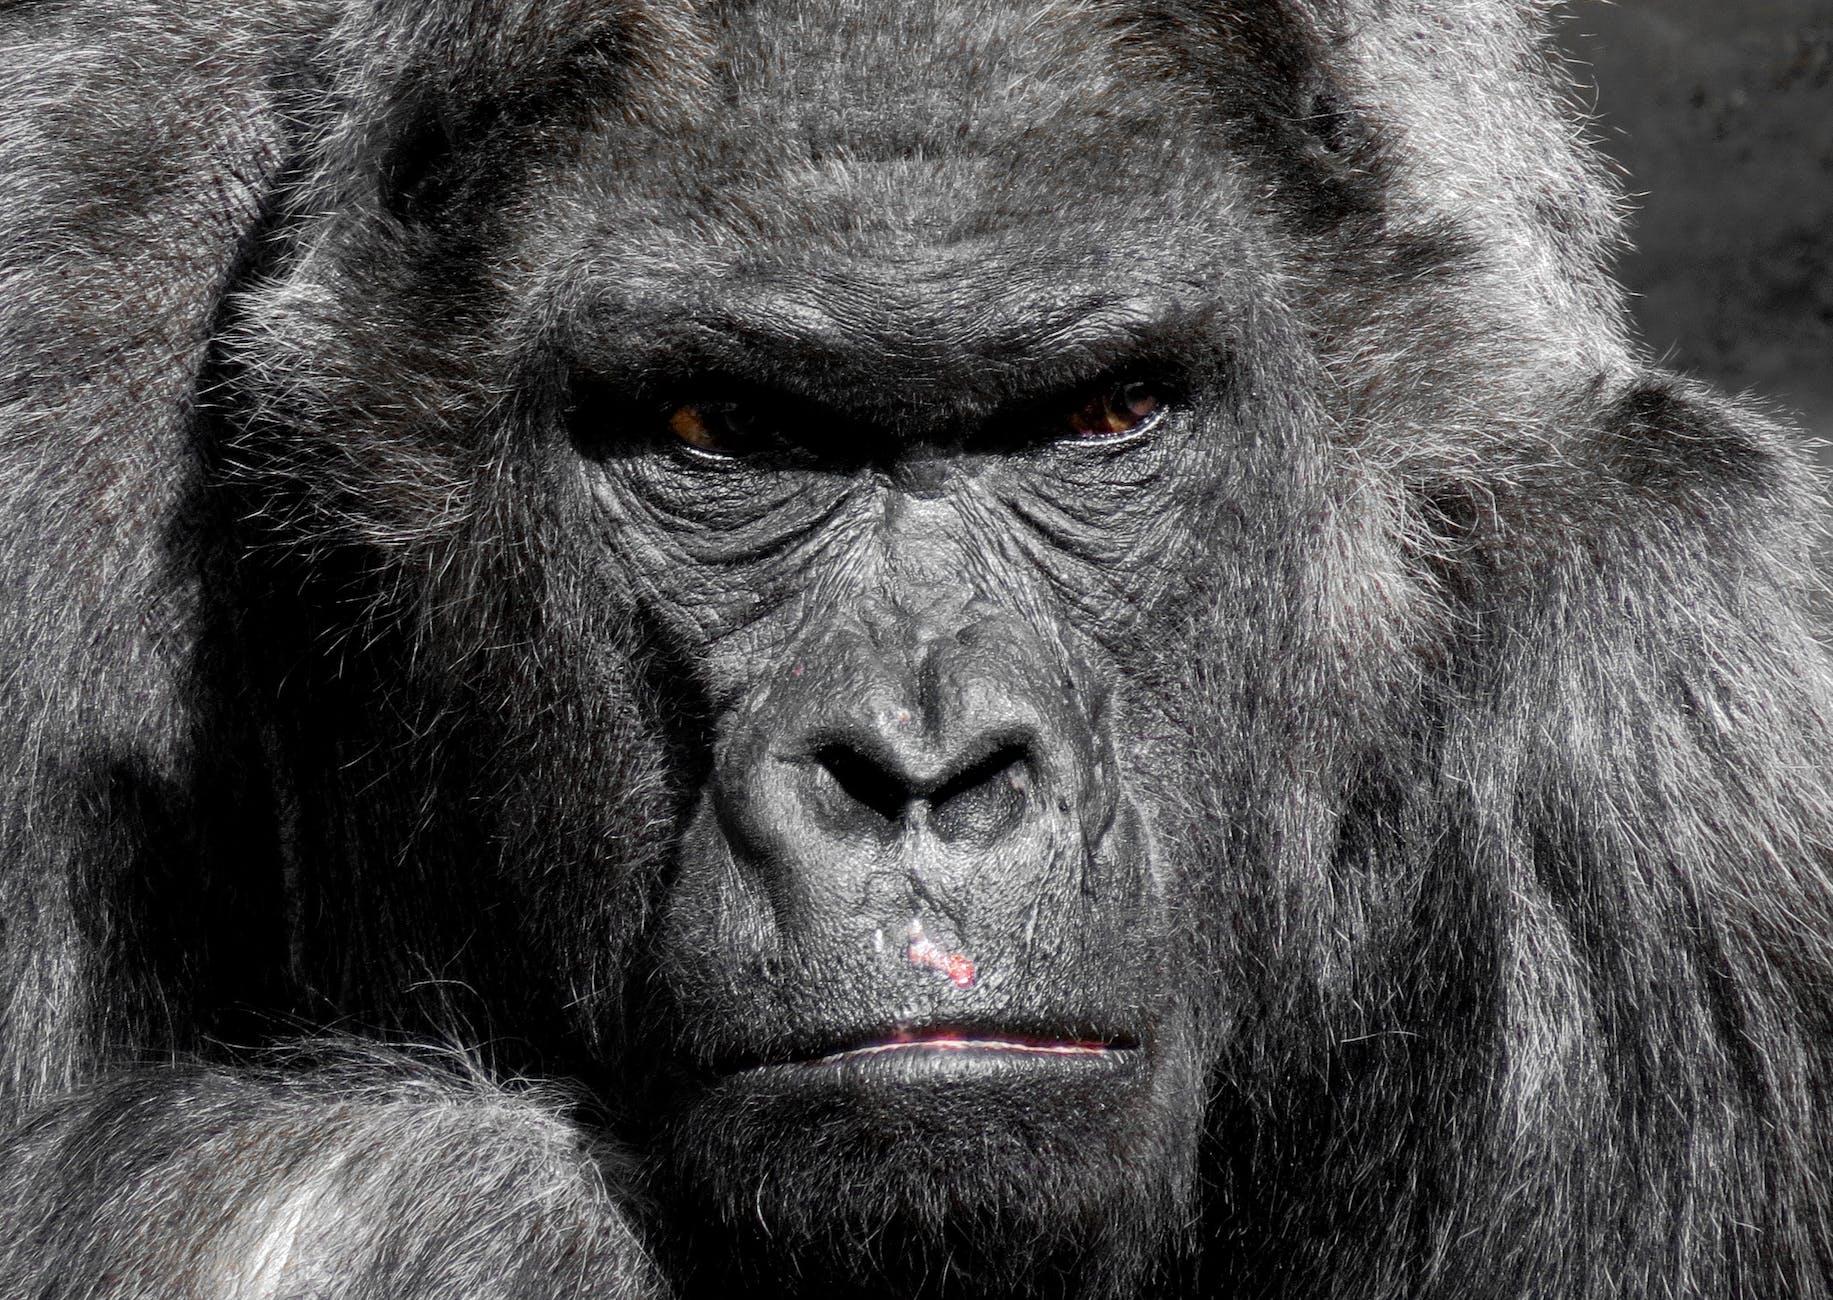 https://images.pexels.com/photos/35992/gorilla-monkey-ape-zoo.jpg?auto=compress&cs=tinysrgb&dpr=2&h=650&w=940